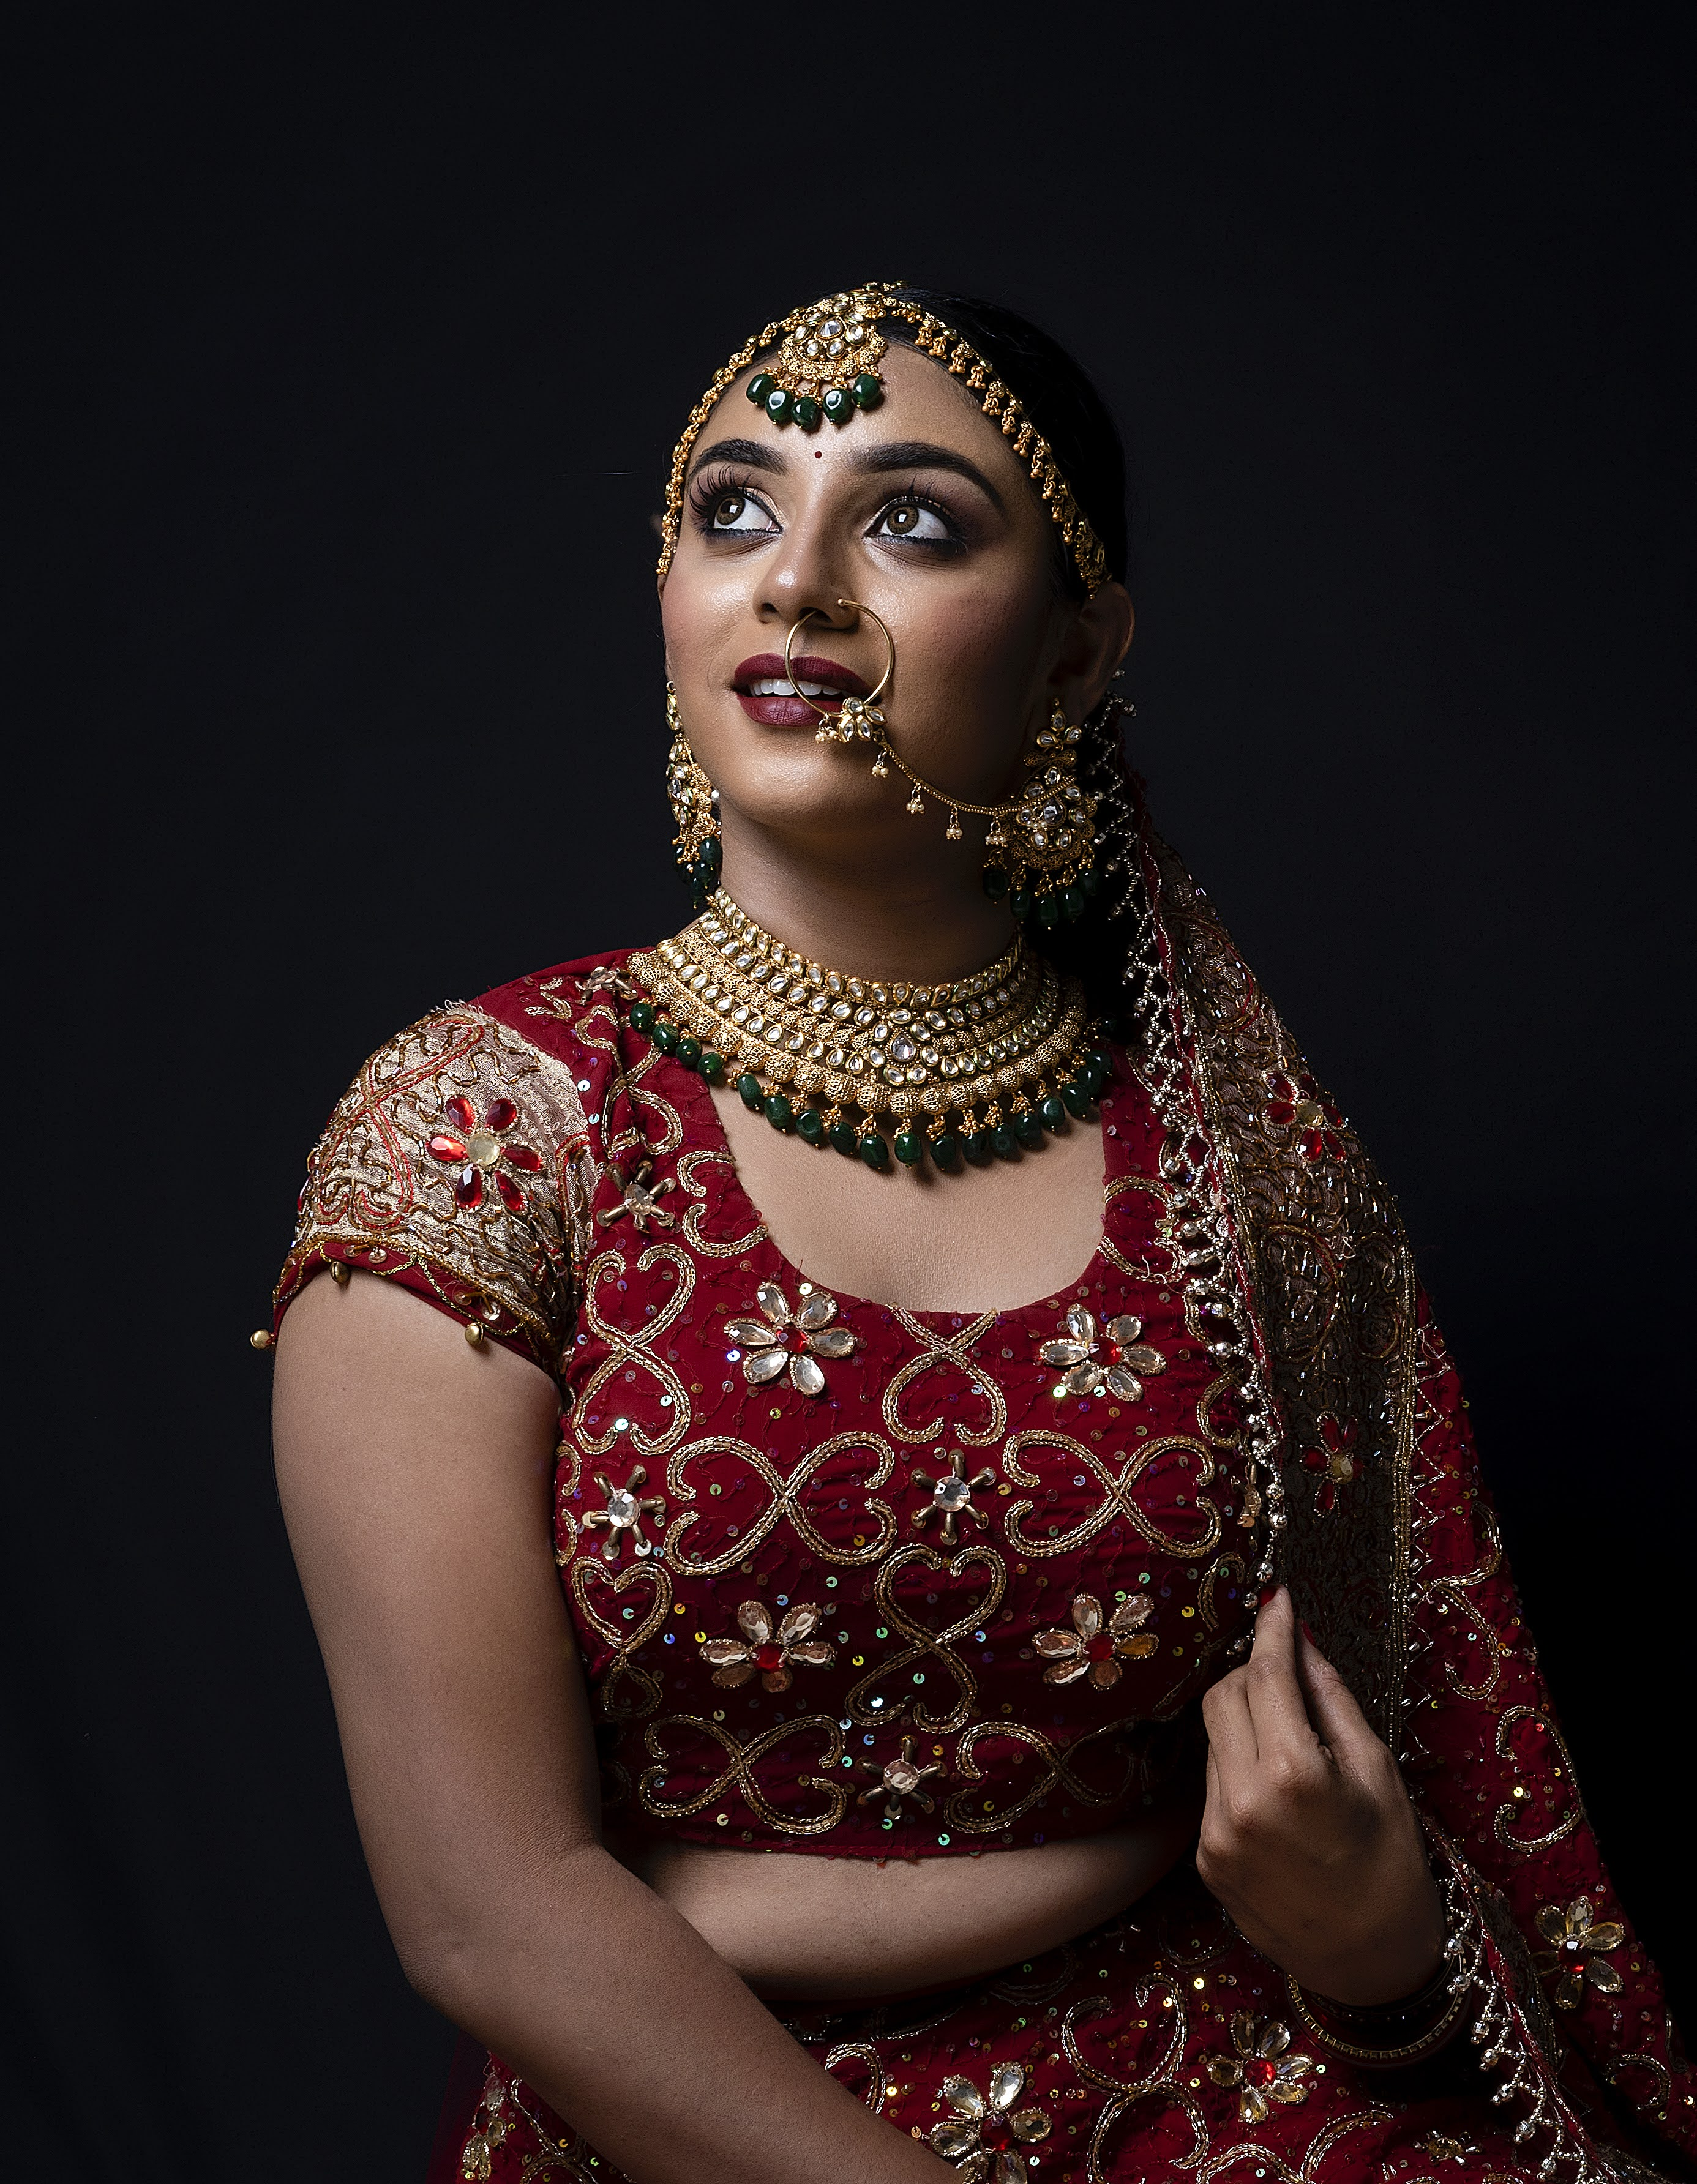 rashmi-anupsurya-makeup-artist-bangalore